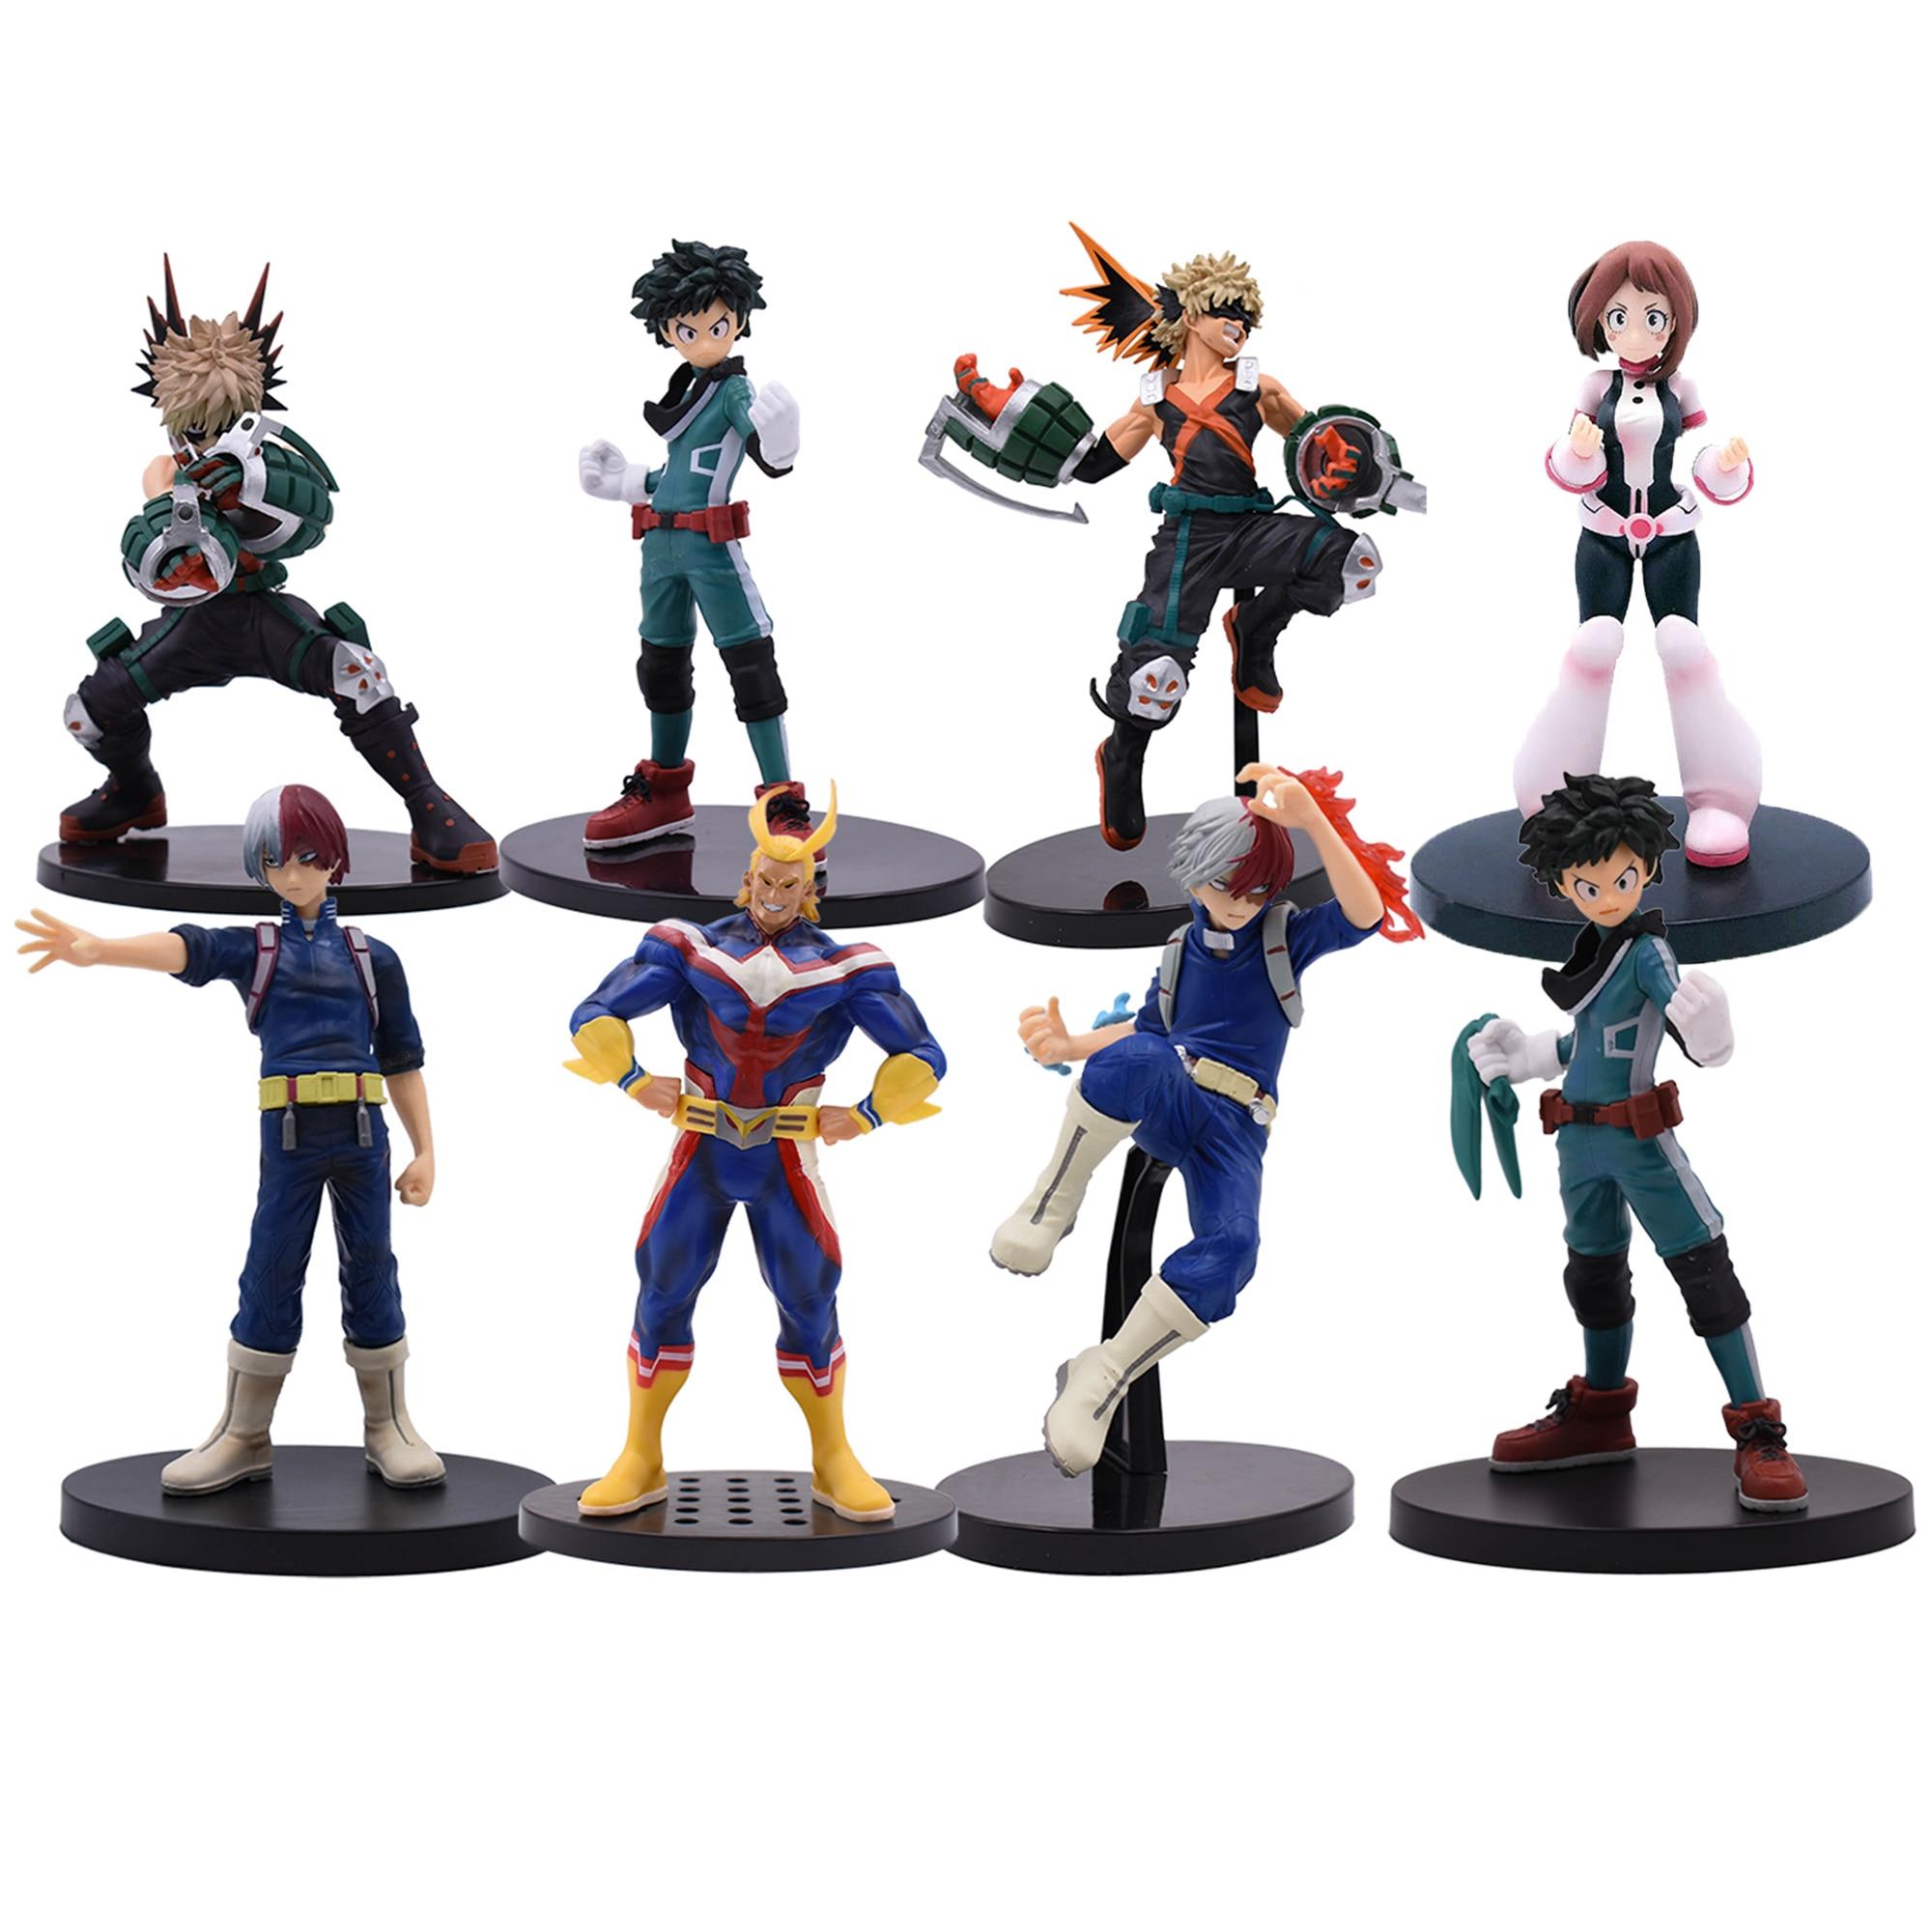 17-20 Cm Anime Figure My Hero Academia PVC Smack Izuku Midoriya Shouto Todoroki Katsuki Boku Amazing Heros Toys Dolls Gift